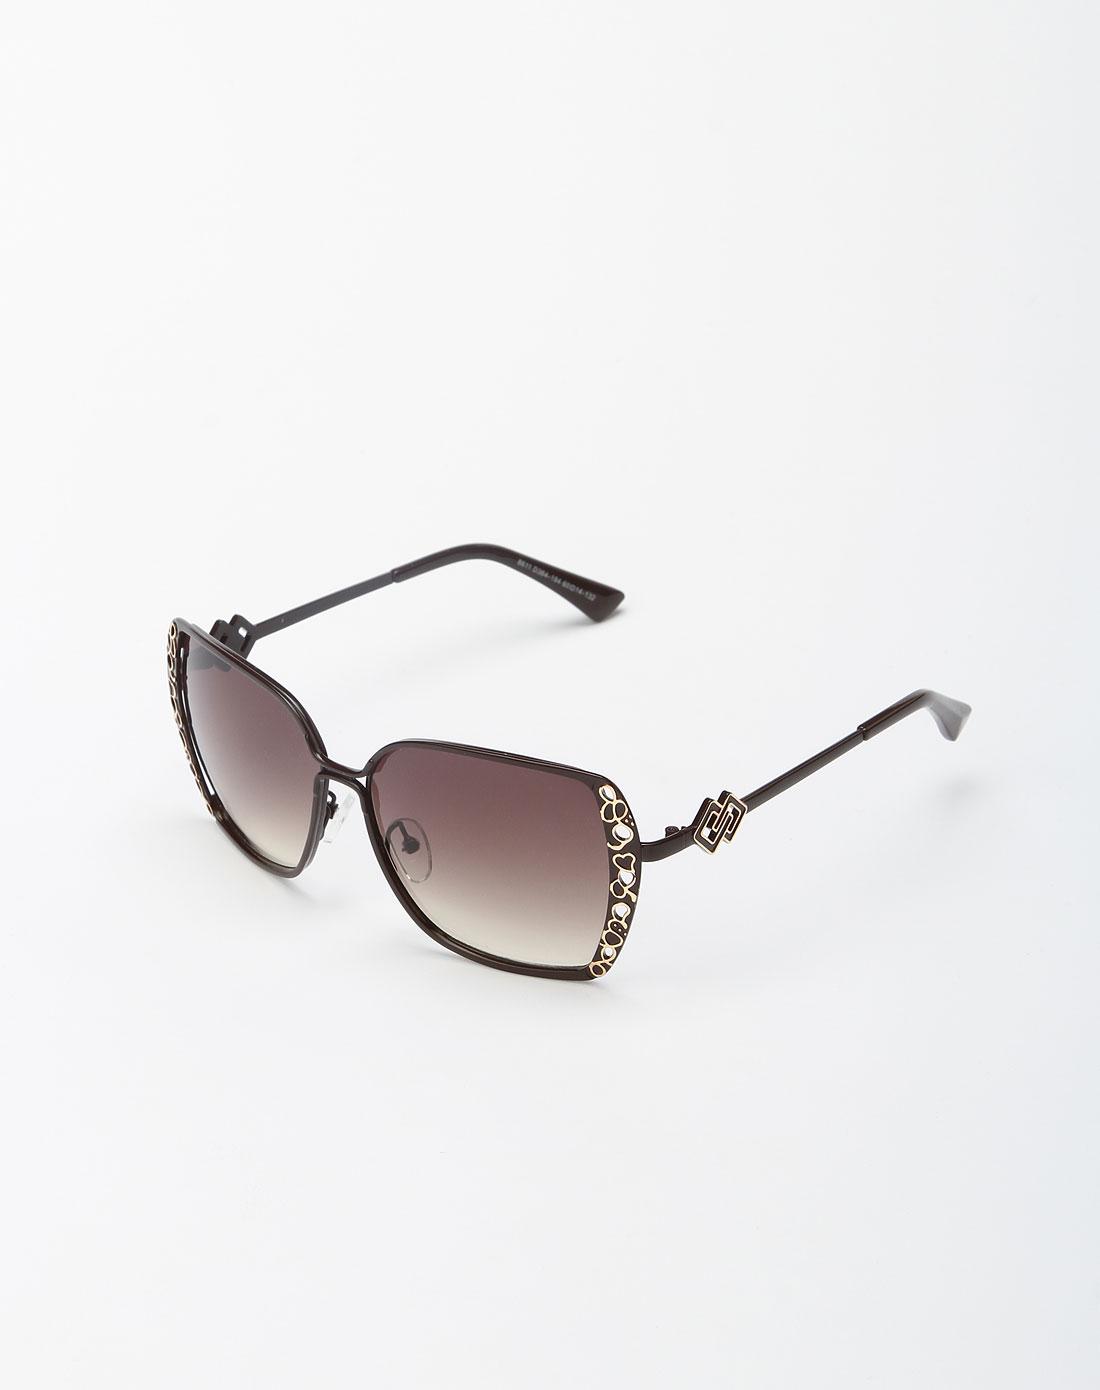 bailewei配件专场棕色可爱心形太阳眼镜7blw2012903